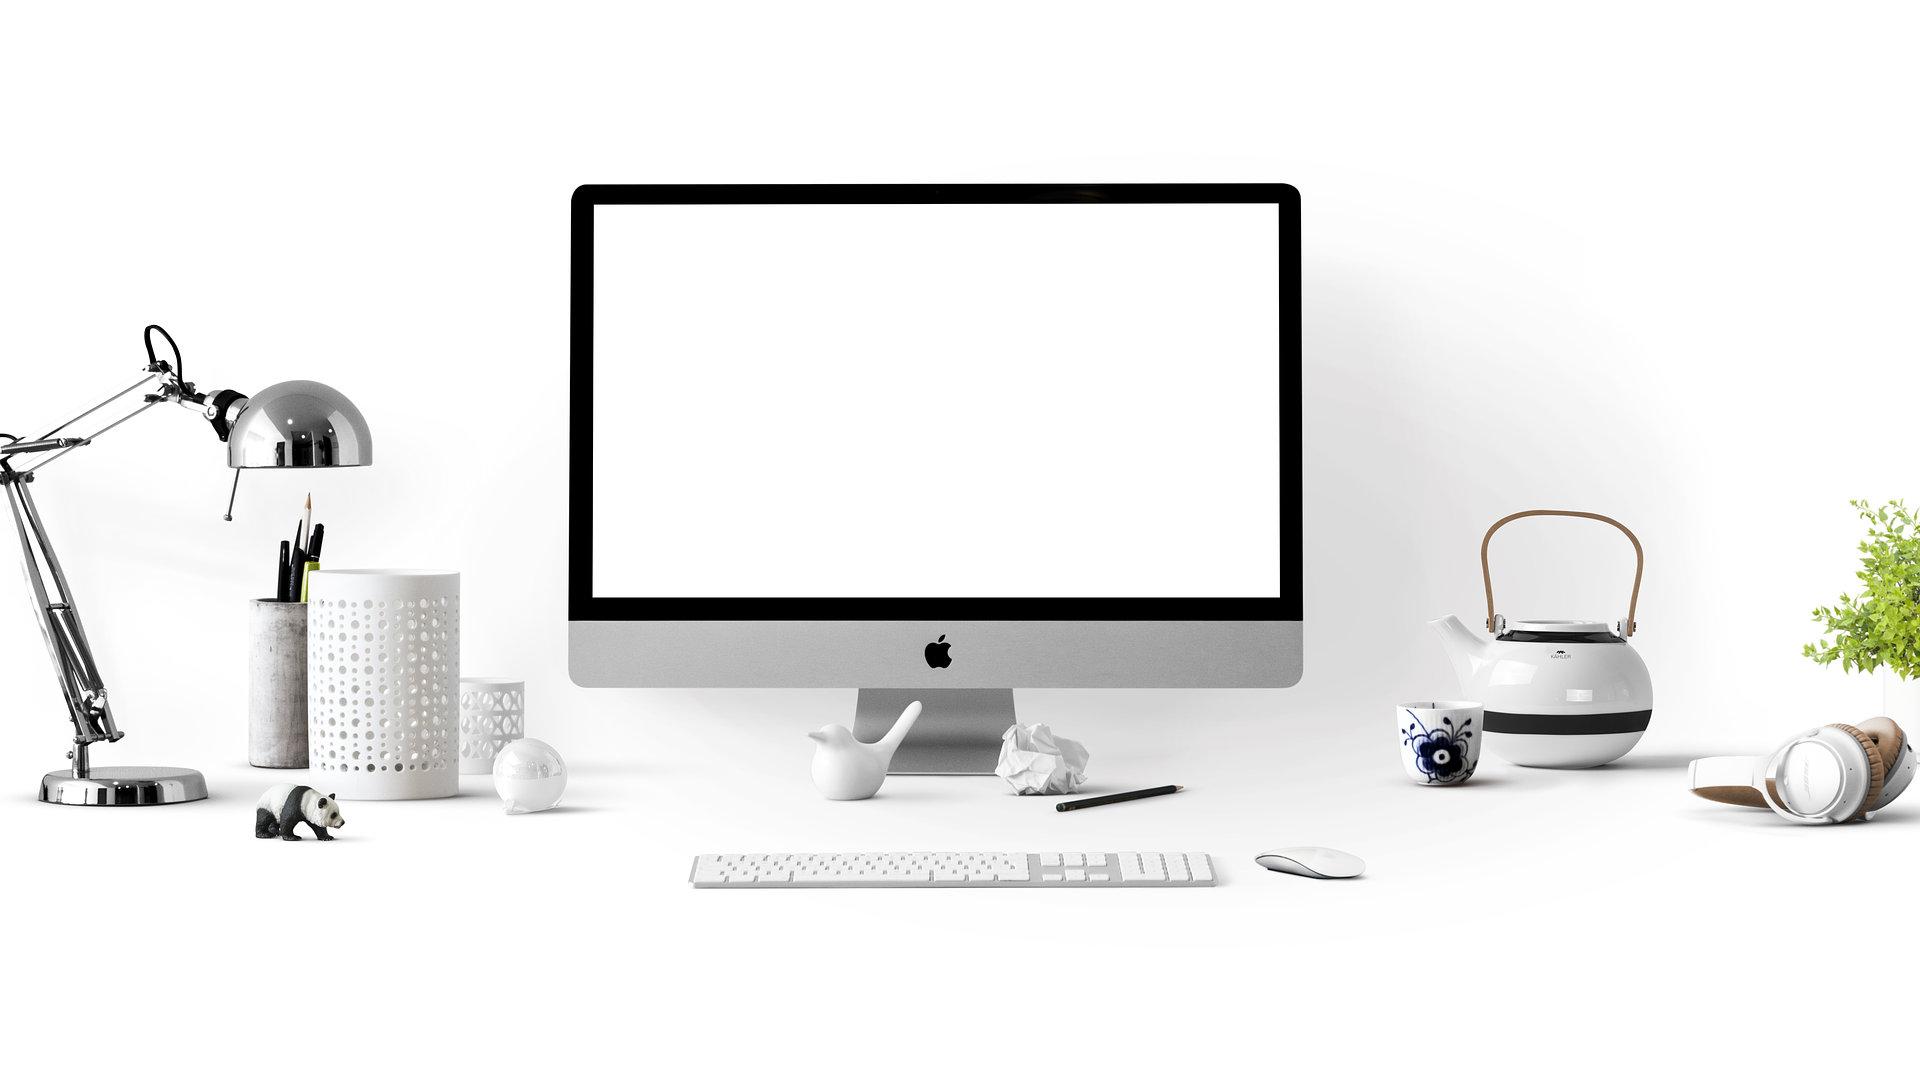 Mejor monitor 24 pulgadas 2018   mejoresdispositivos.com